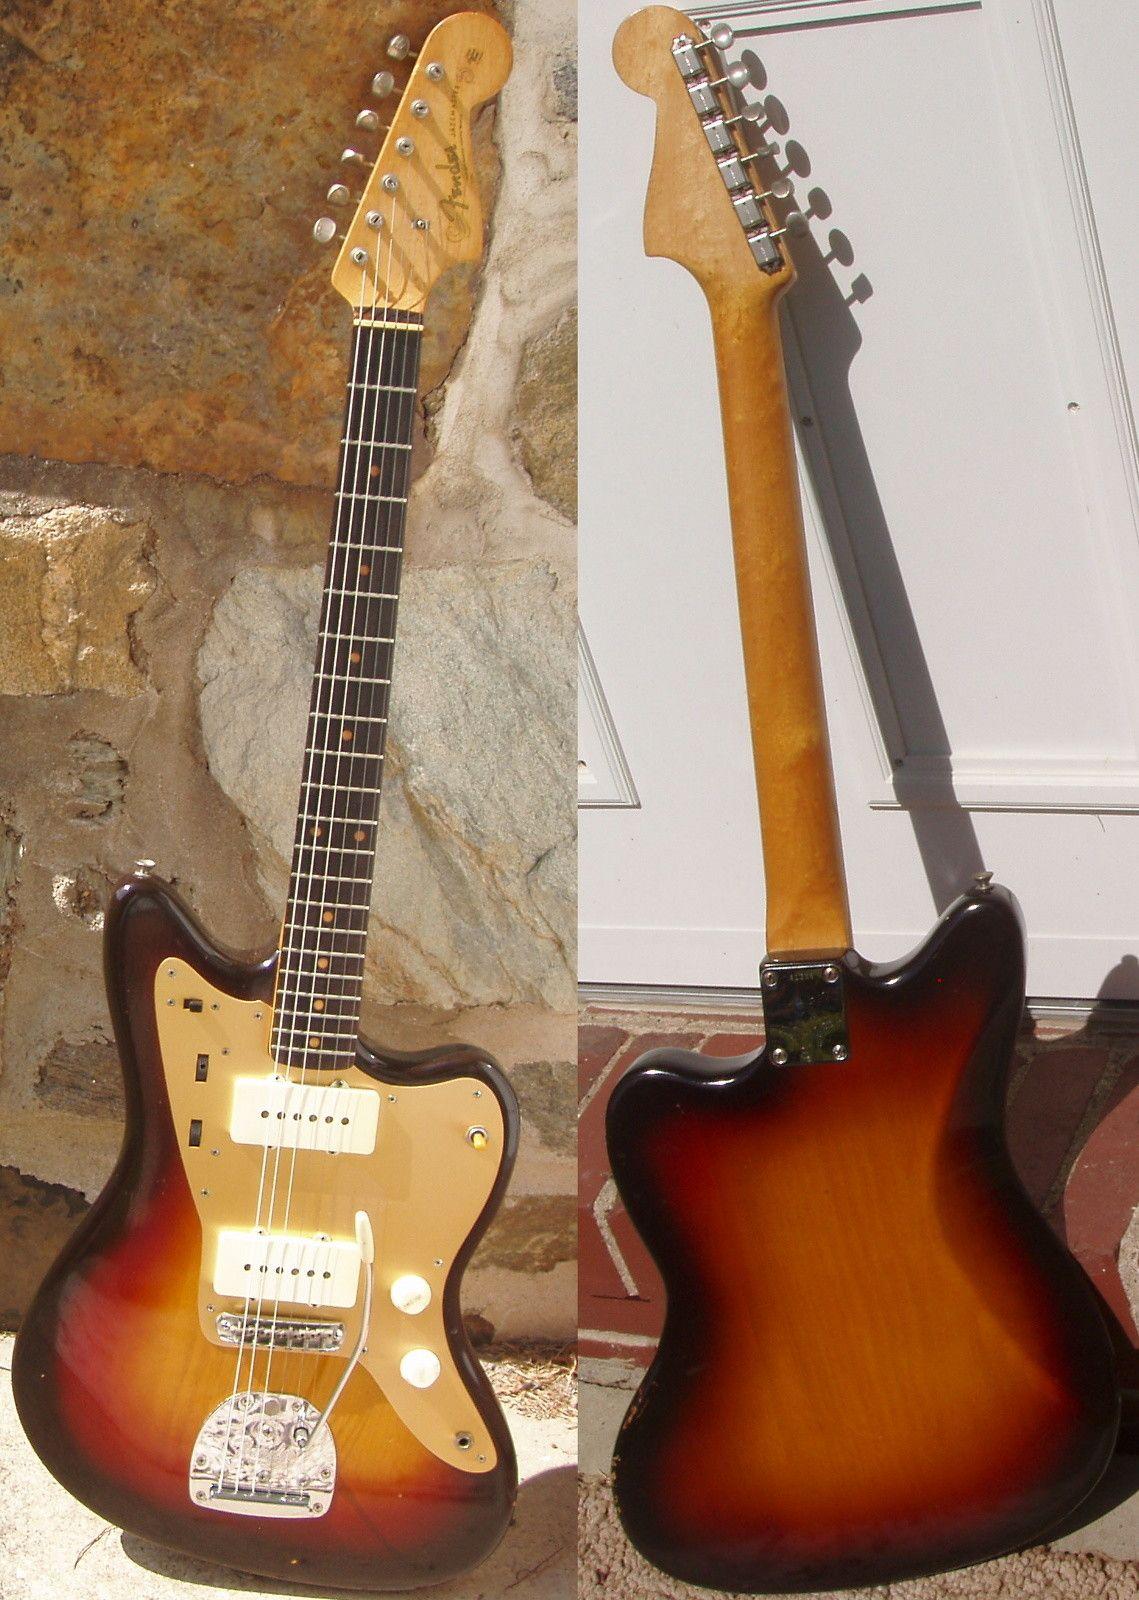 Fender Jazzmaster 1959 | Scoot | Jazz guitar, Guitar, Vintage guitars